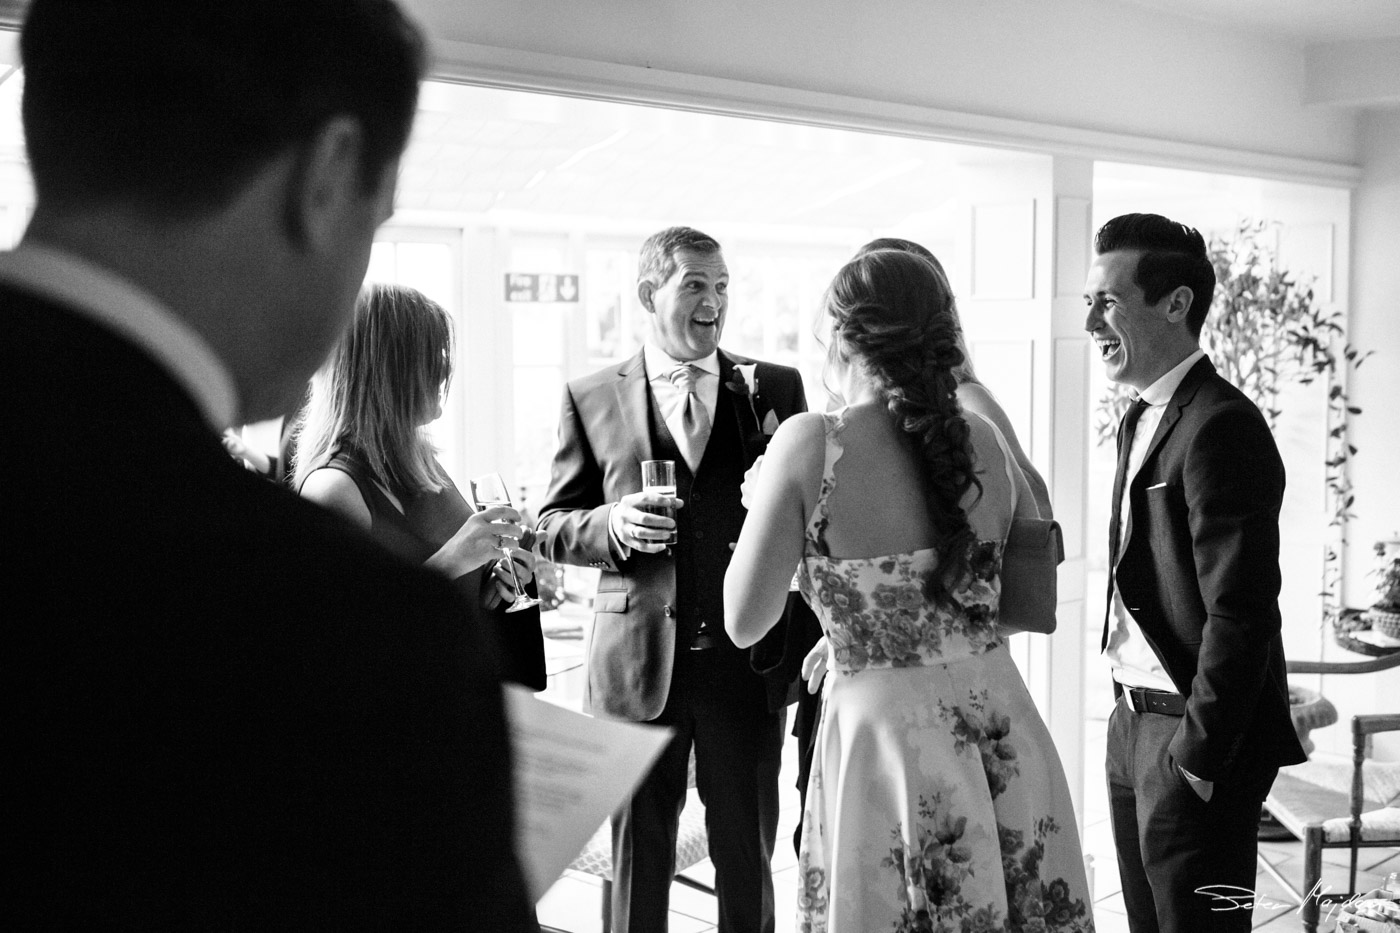 east-bridgford-hill-wedding-photography-15.jpg